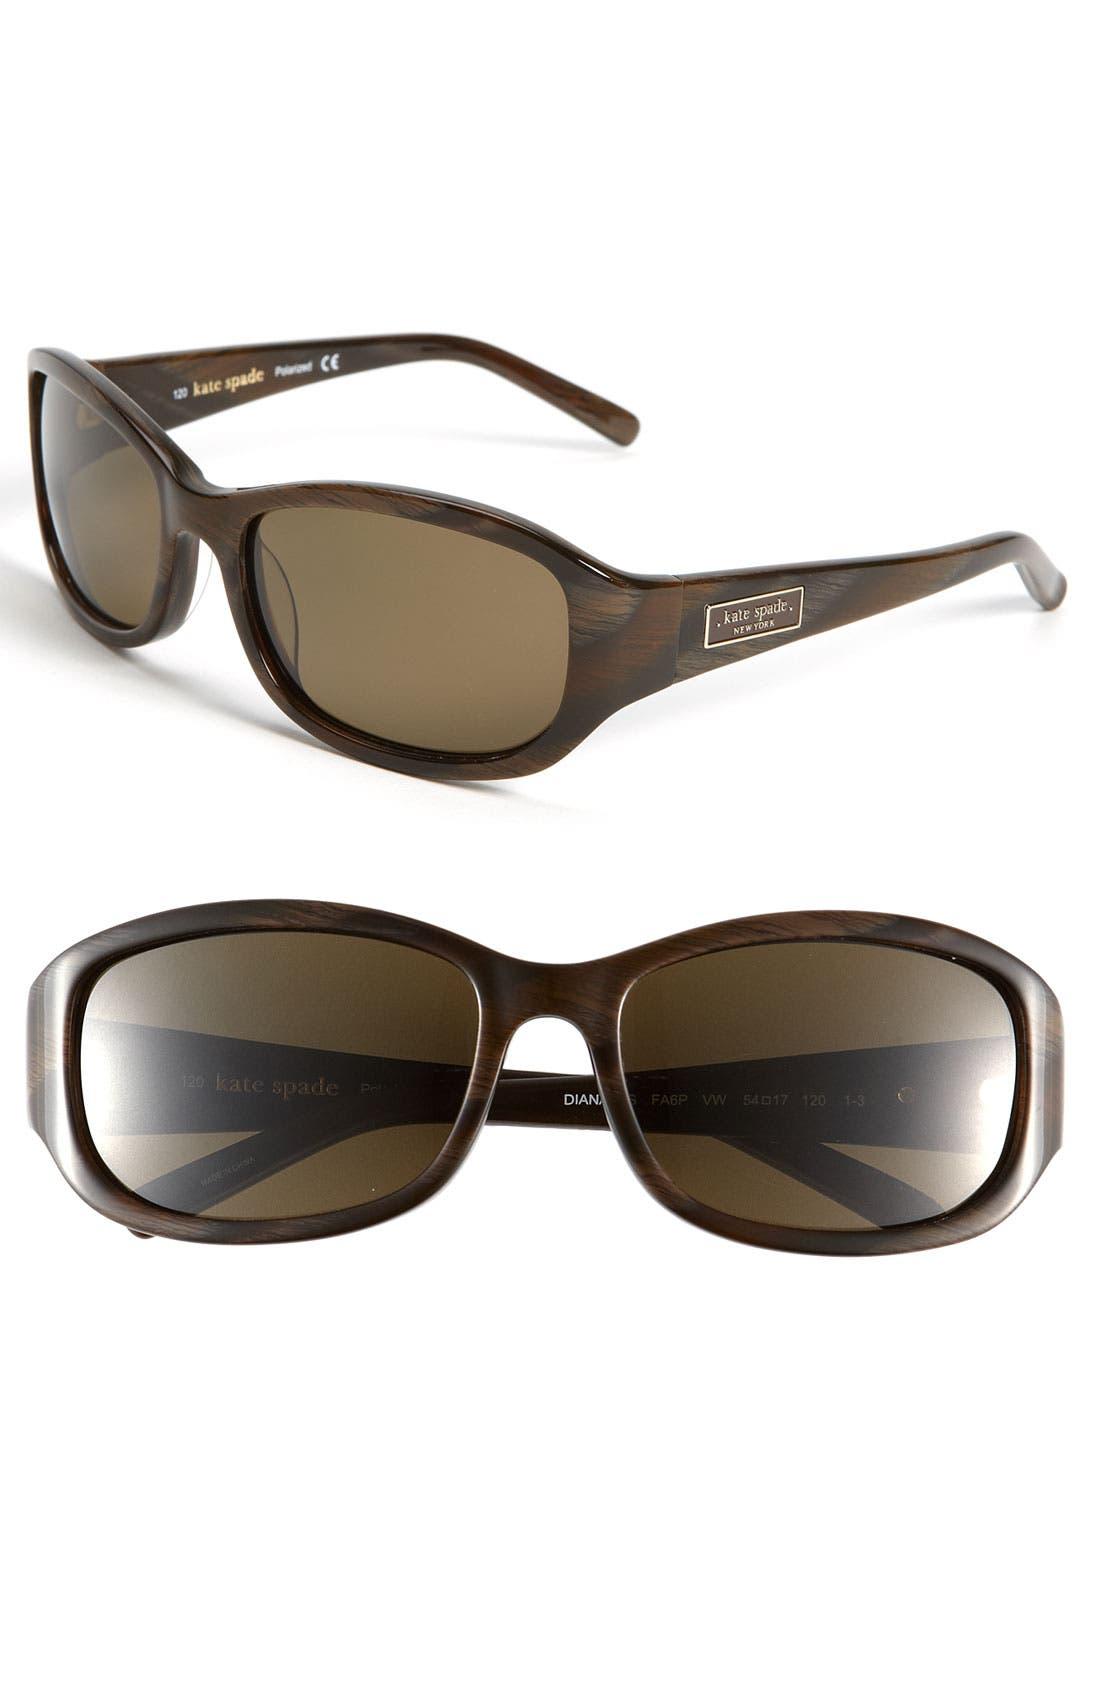 Main Image - kate spade new york 'diana' 54mm polarized sunglasses